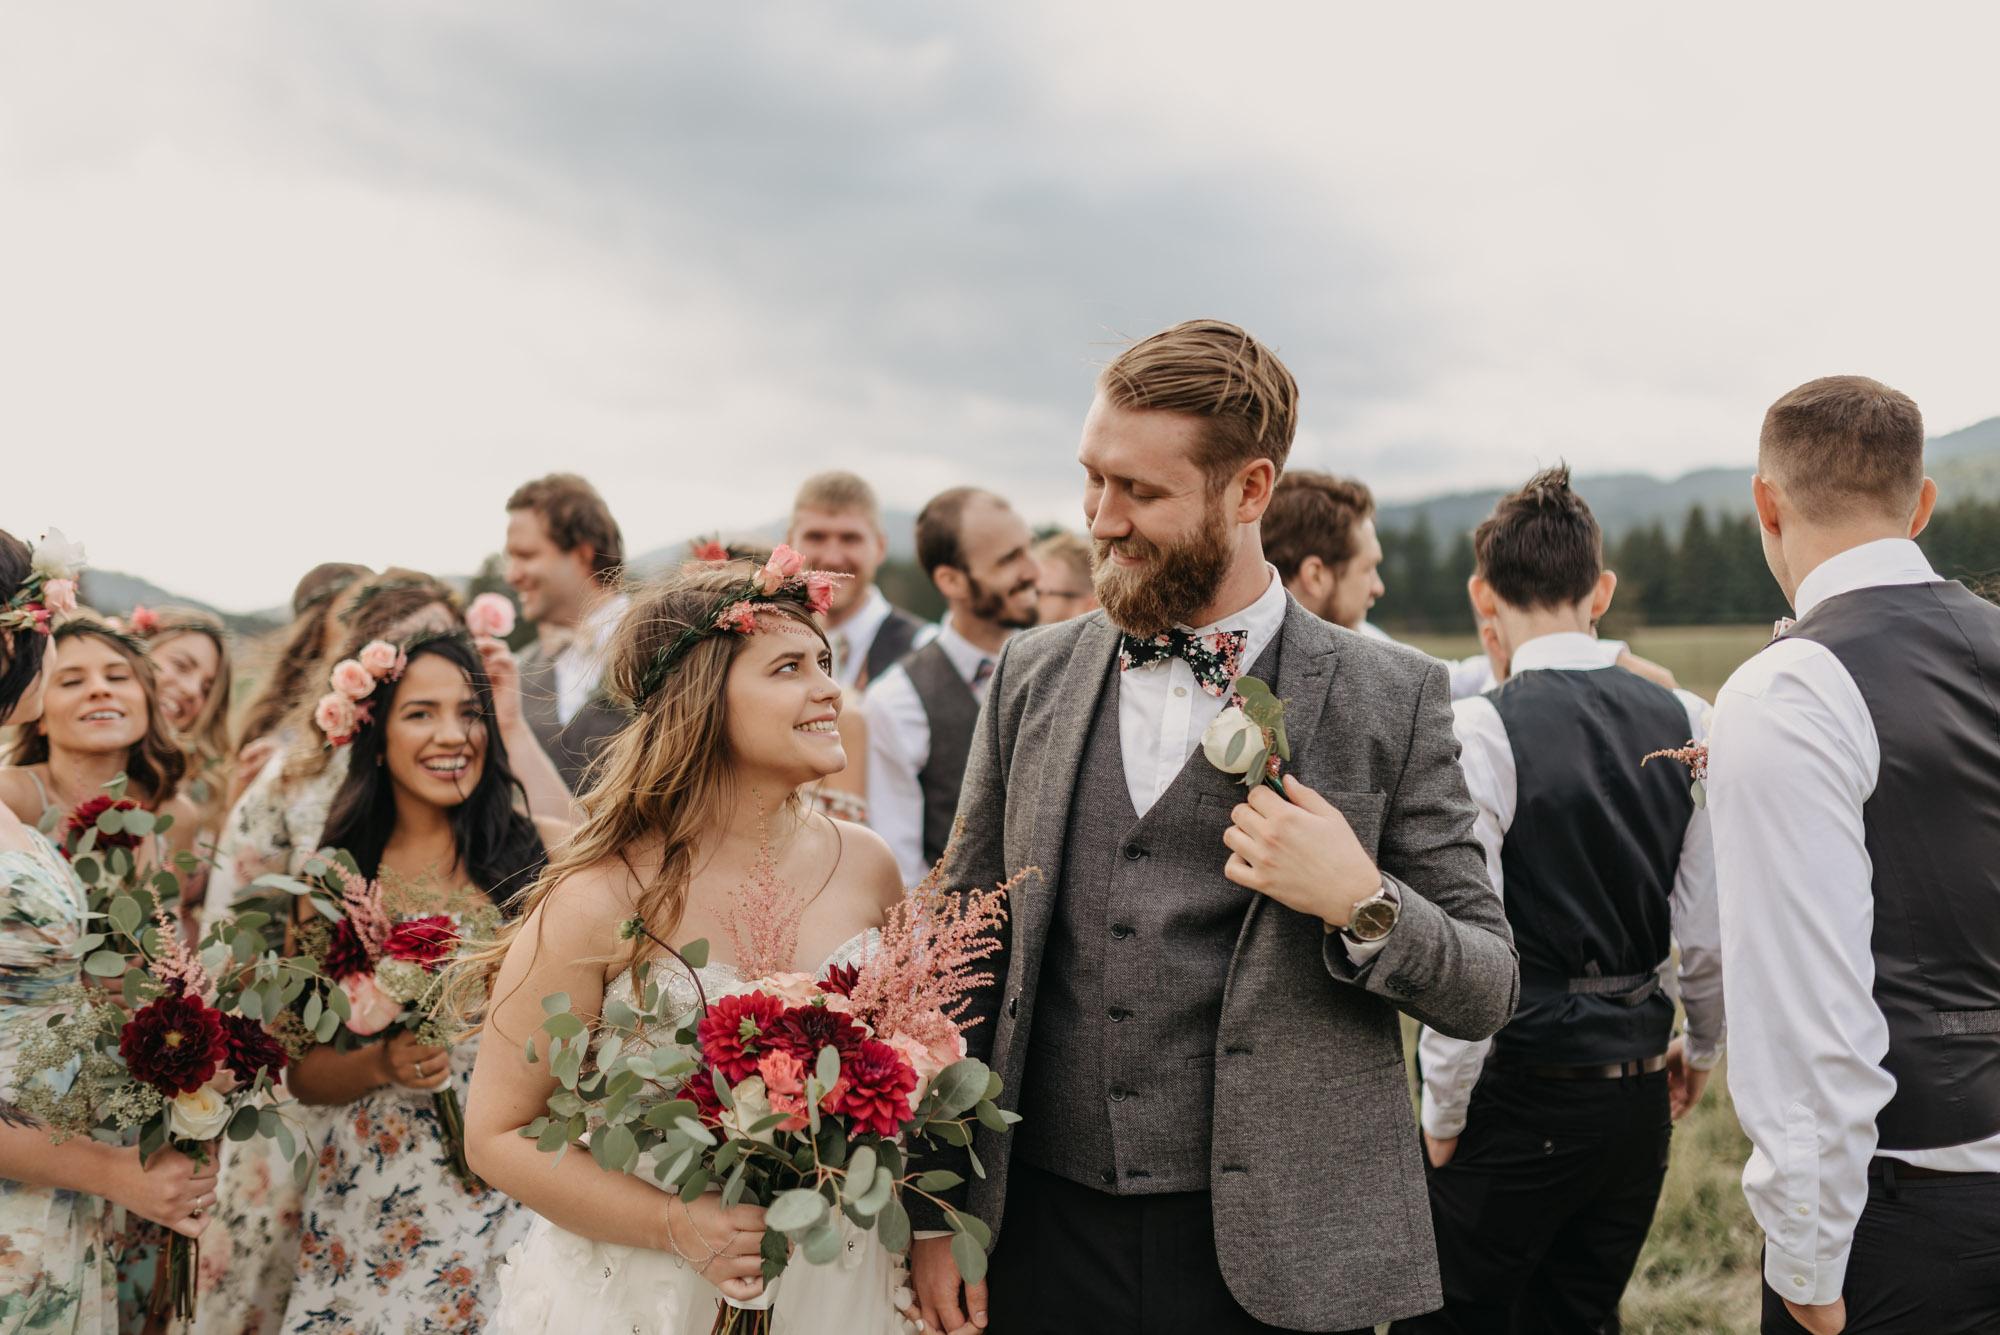 Bridal-Party-Free-People-Flower-Dresses-Washington-Wedding-8668.jpg